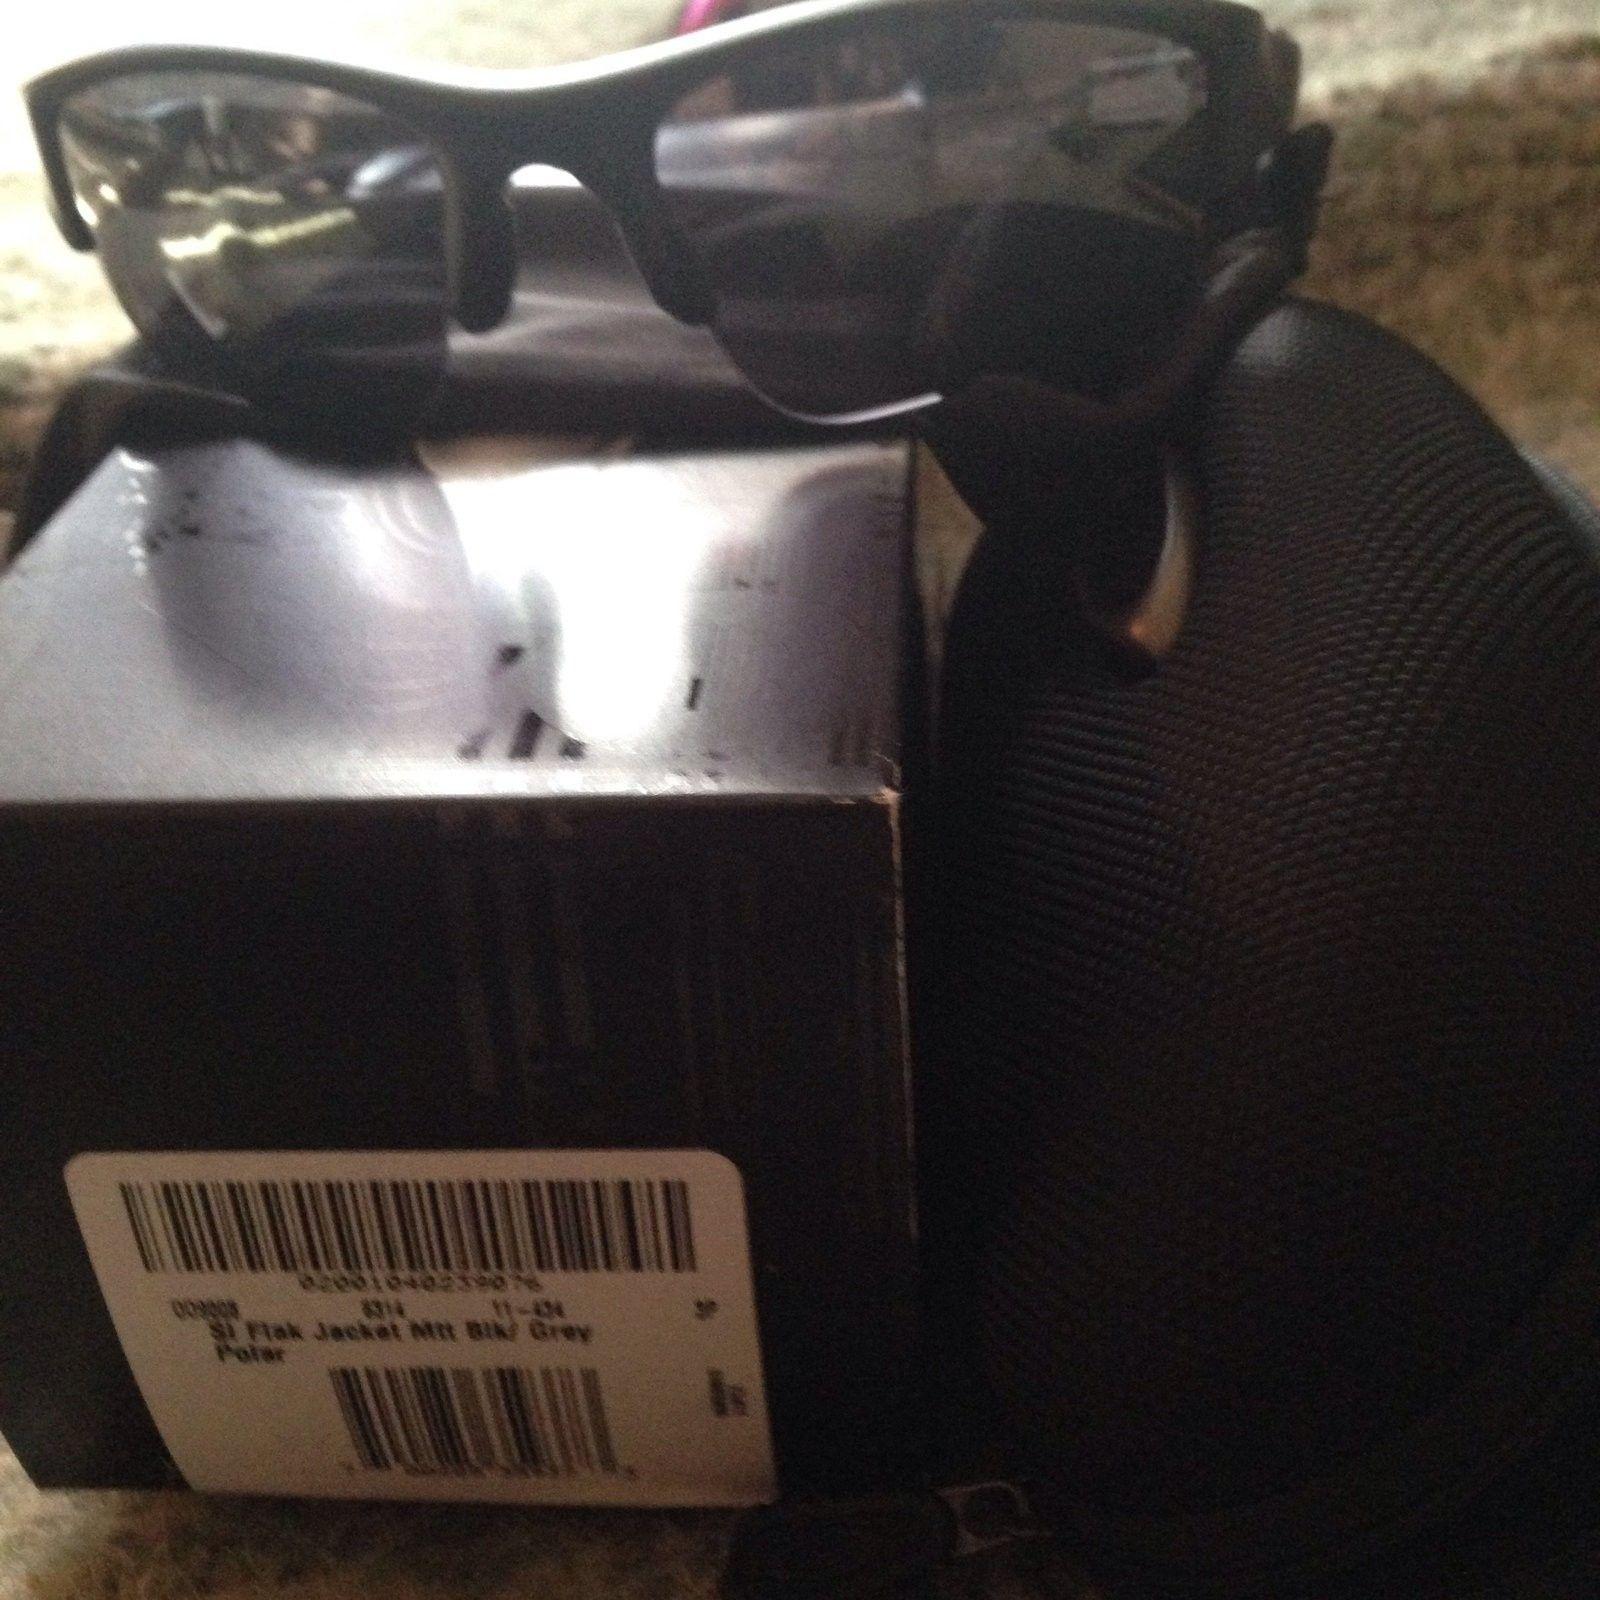 BNIB ih hj 2  +red $ original lenses, si matte black grey non polar BNIB Flak xlj ,grey Sj - image.jpg